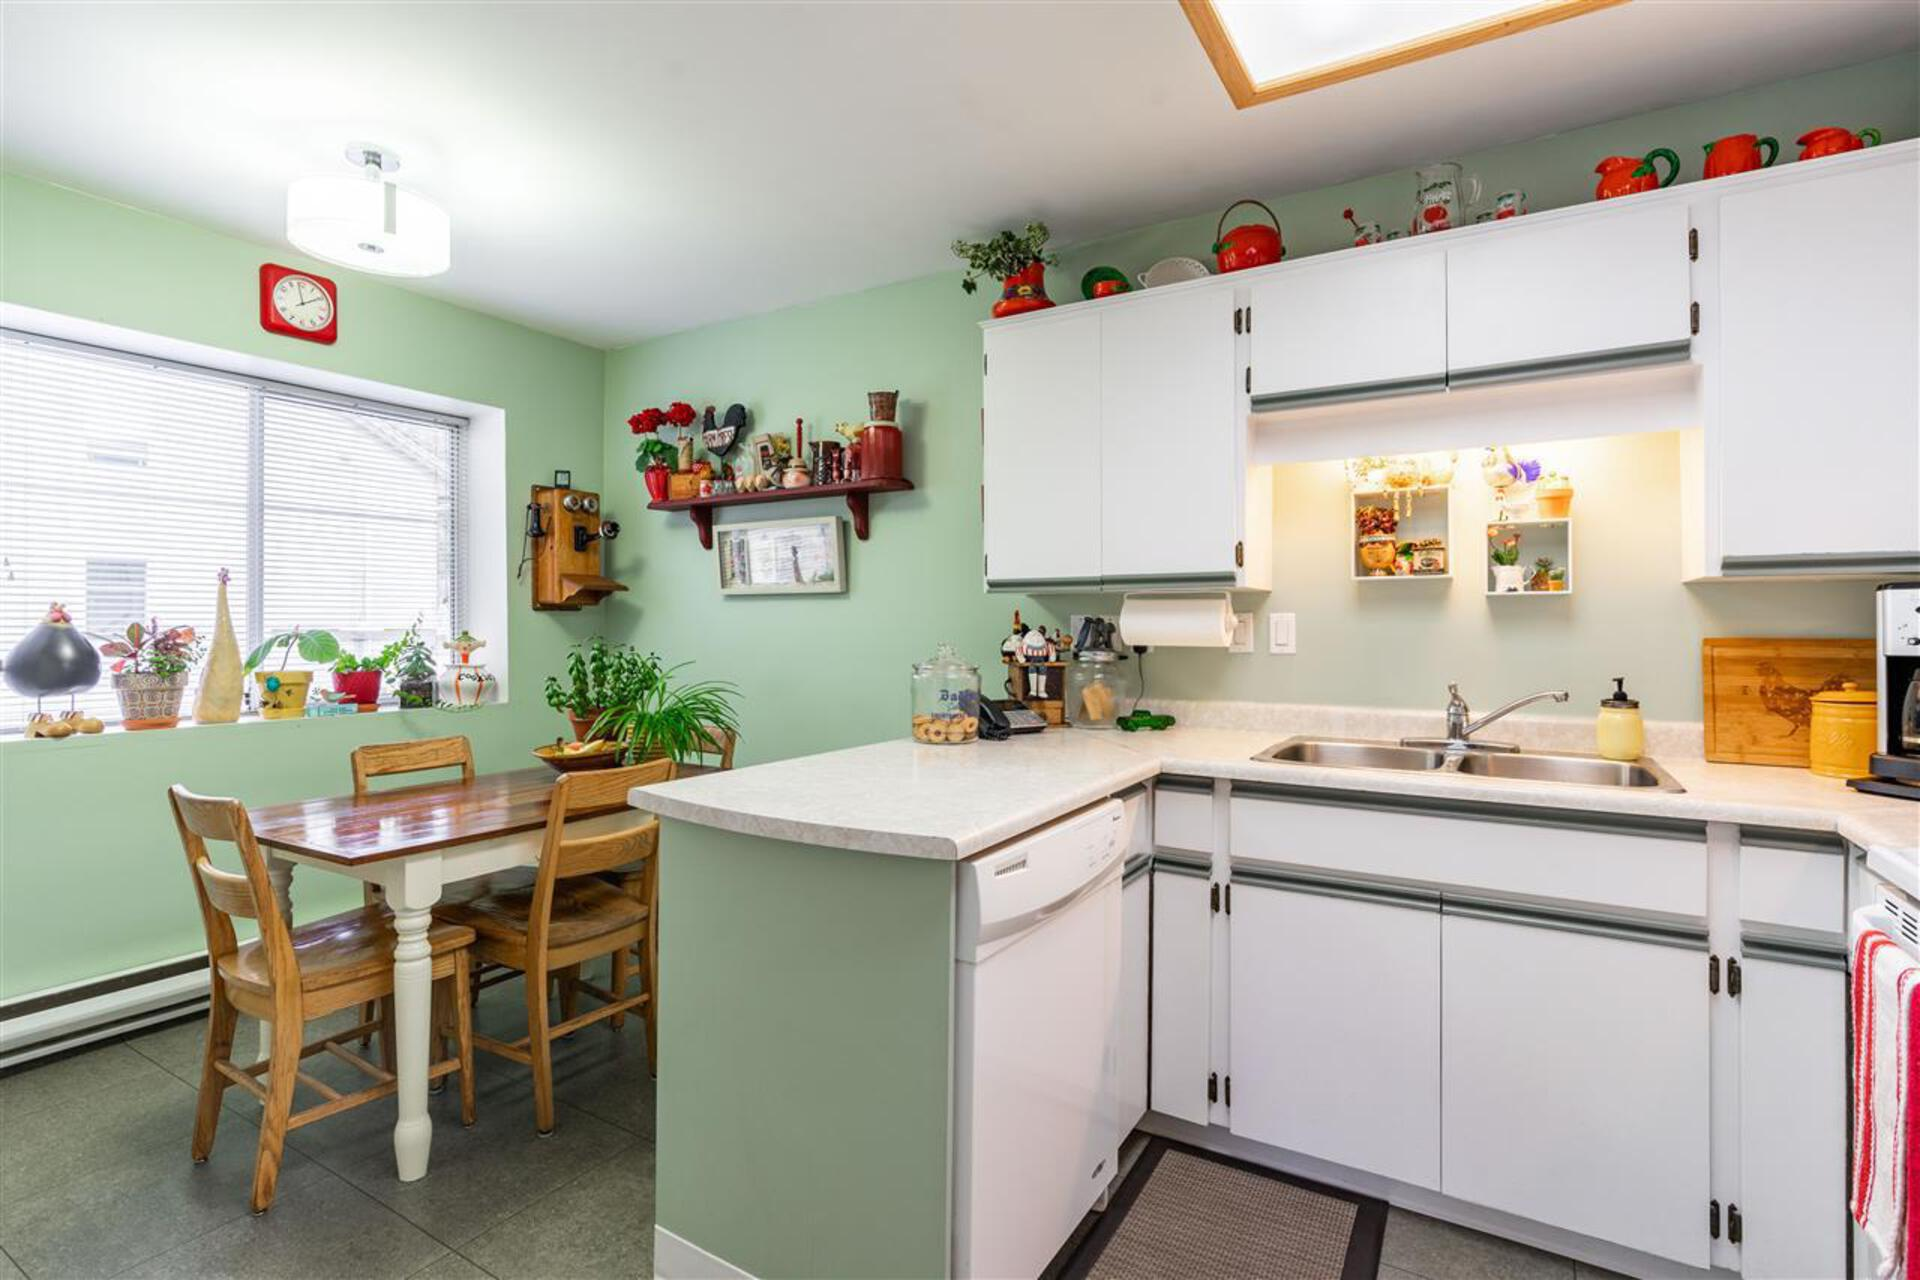 1318-brunette-avenue-maillardville-coquitlam-11 of 1 - 1318 Brunette Avenue, Maillardville, Coquitlam